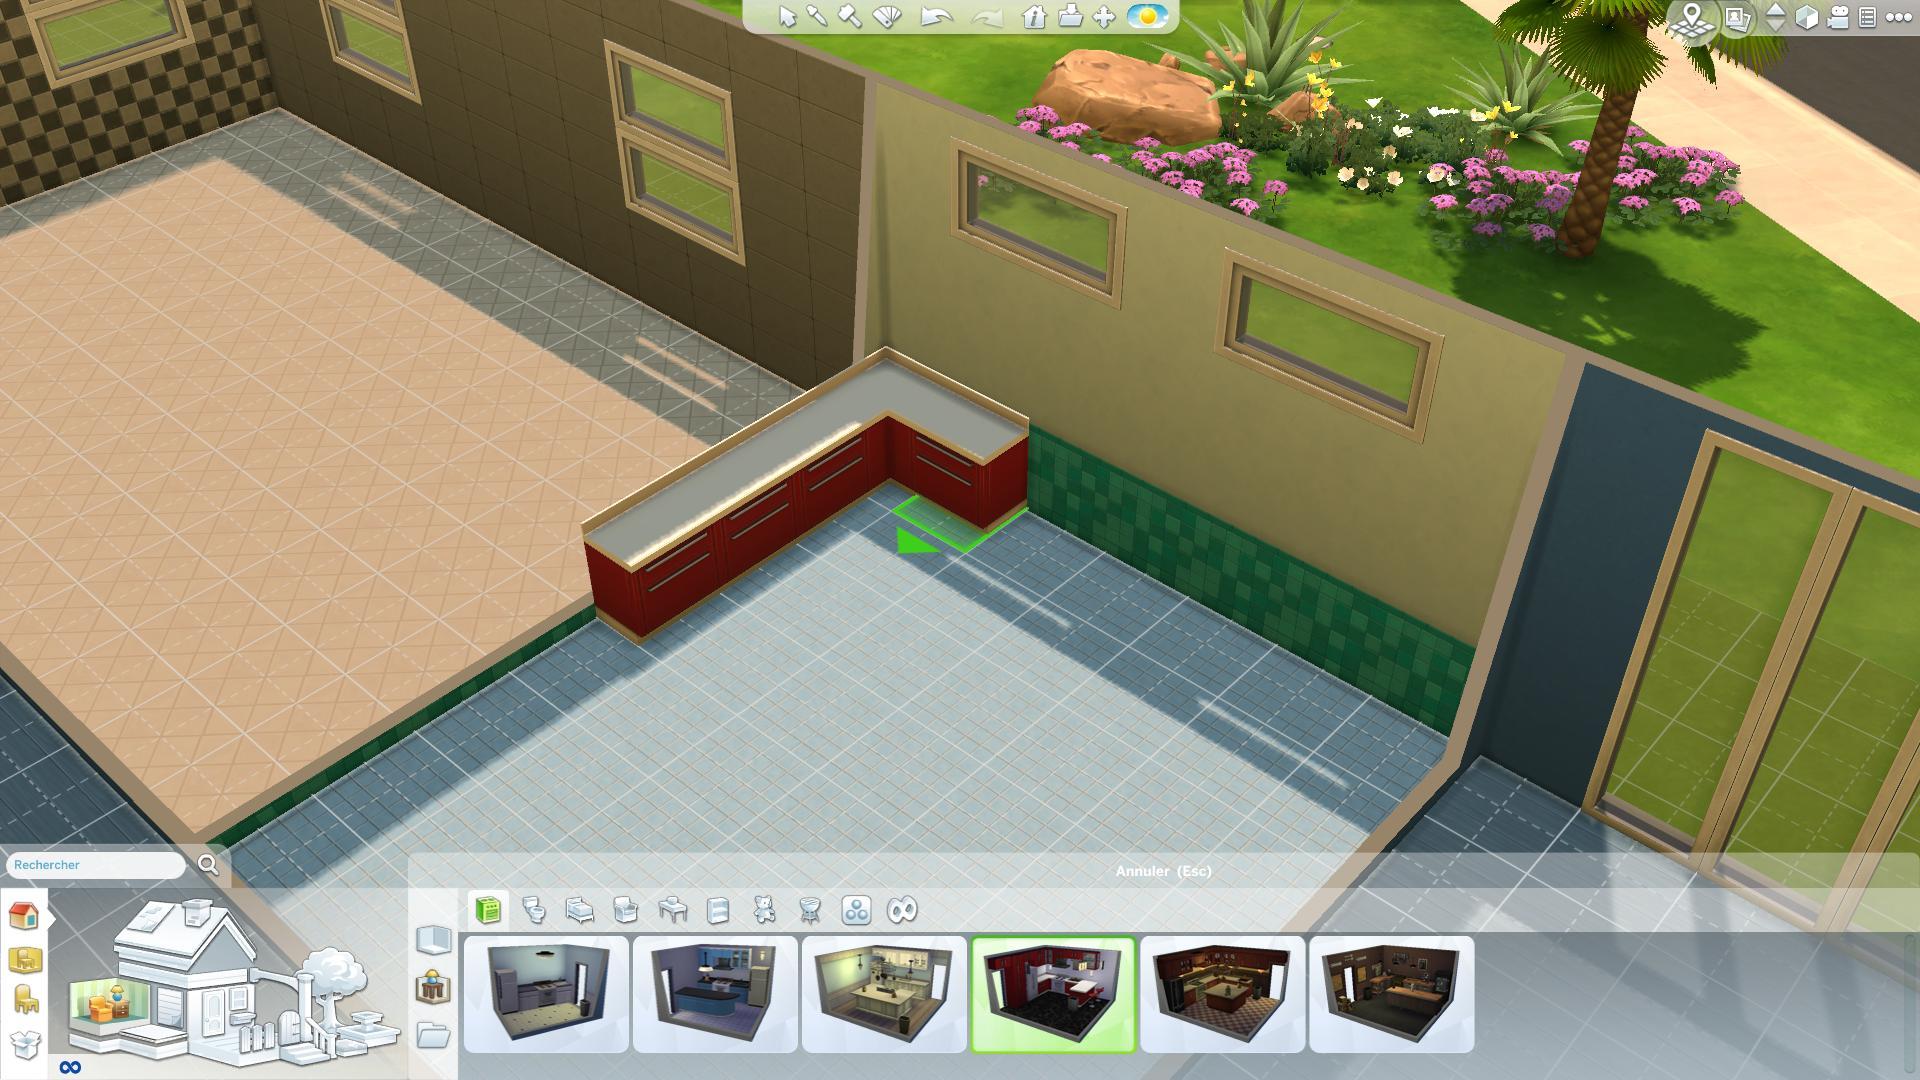 Les sims 4 construire sa maison 3 game guide for Exterieur sims 4